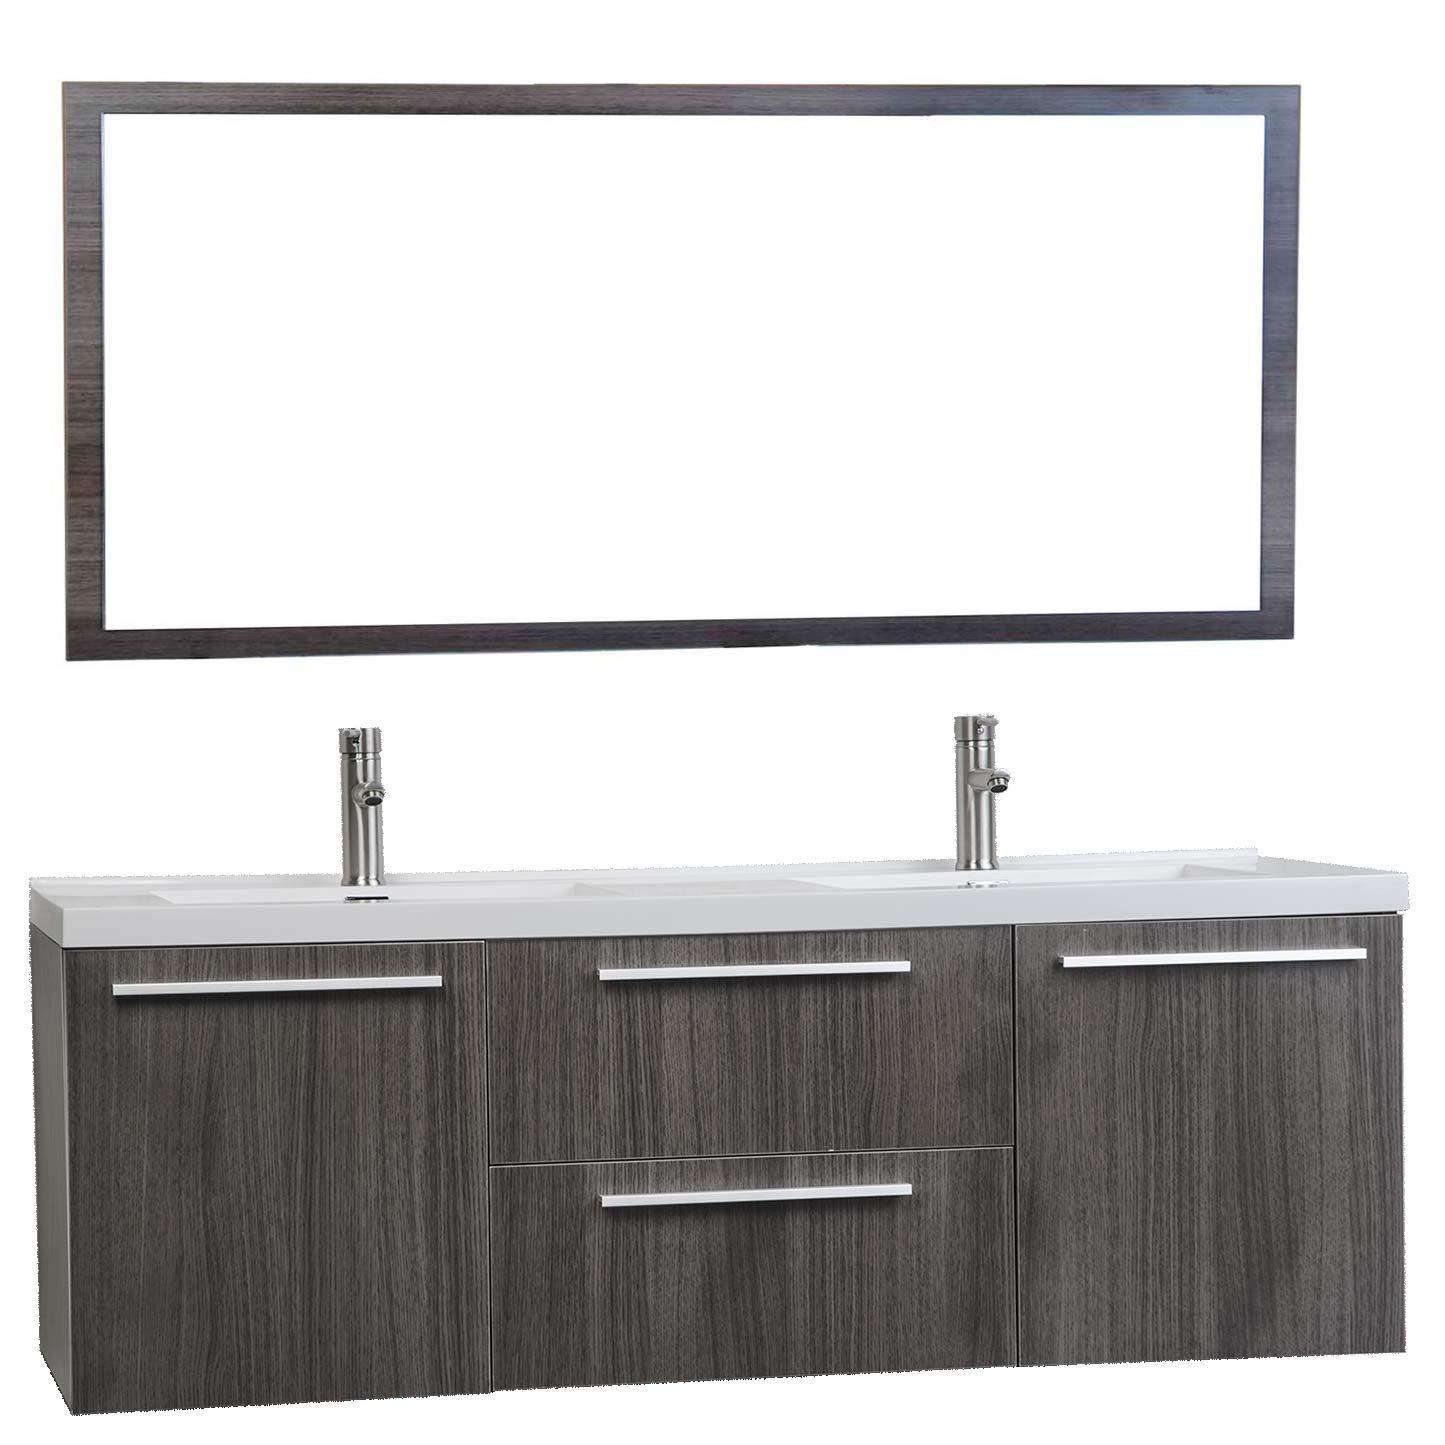 59 Inch Wall Mounted Modern Double Vanity In Grey Oak Tn Nt1500d Bathroom Vanities San